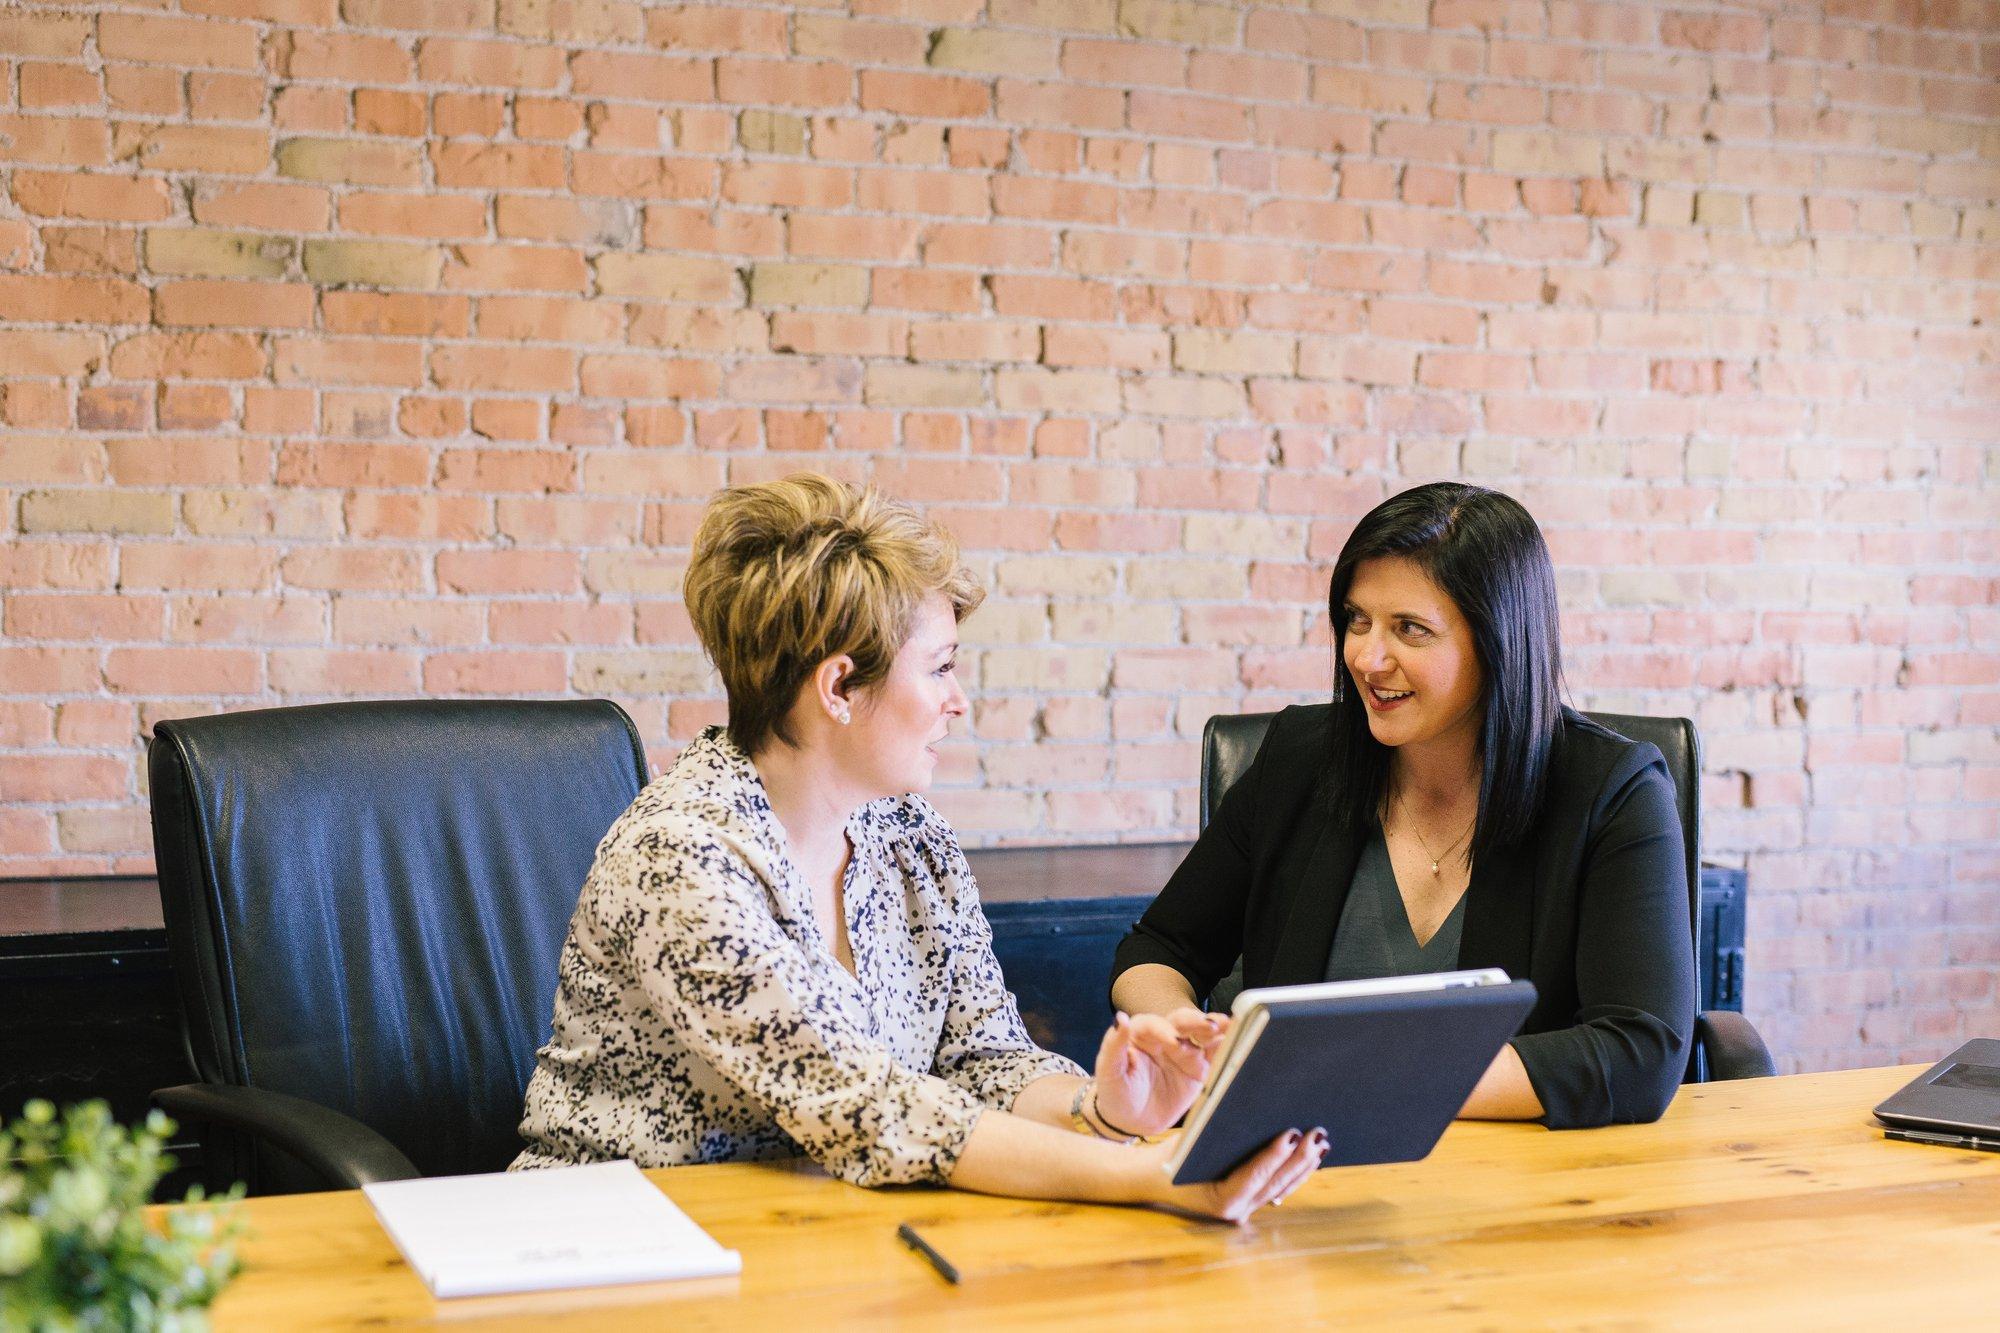 5 Tips to Establish a Strong Real Estate Marketing Partnership